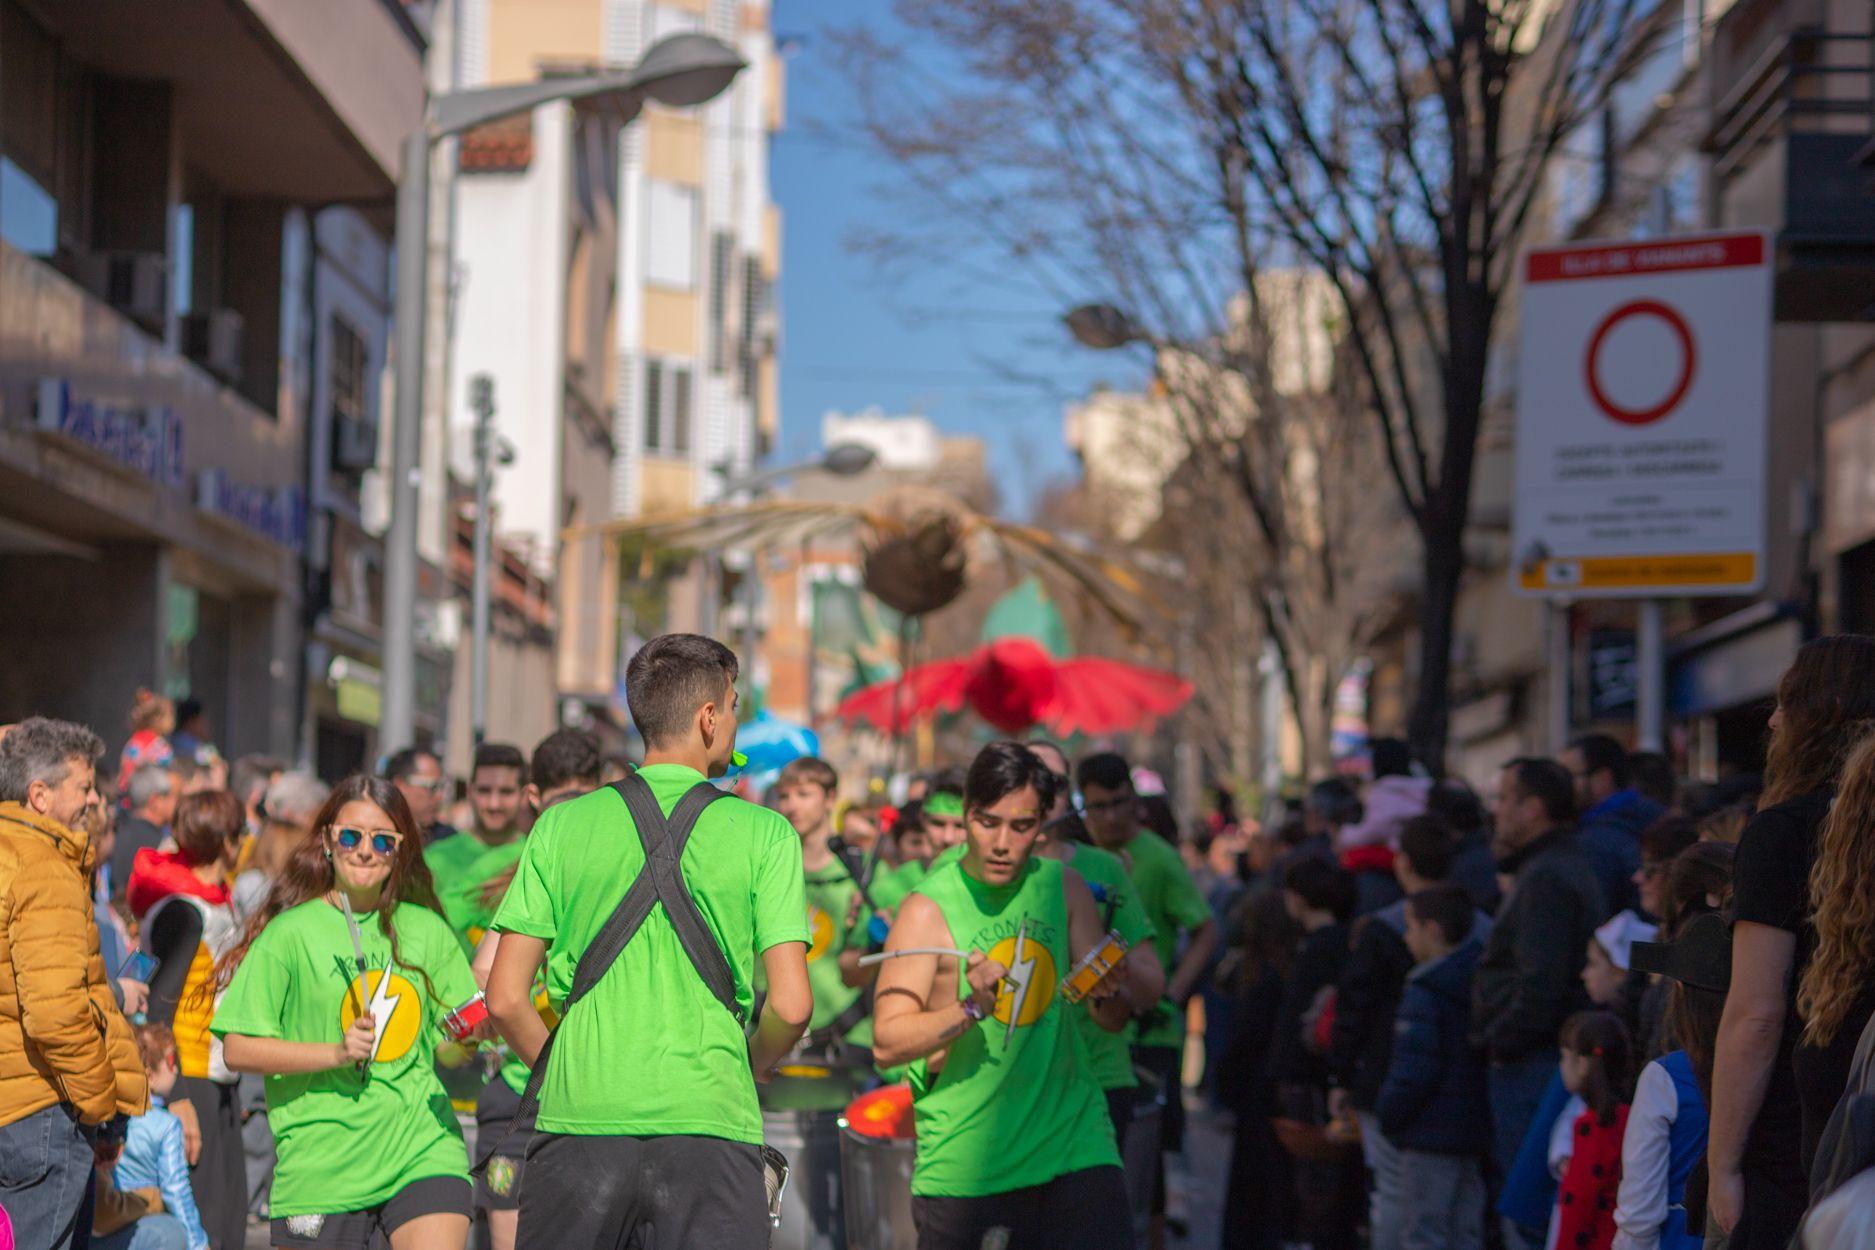 Rua infantil a Rubí. Carnaval 2020